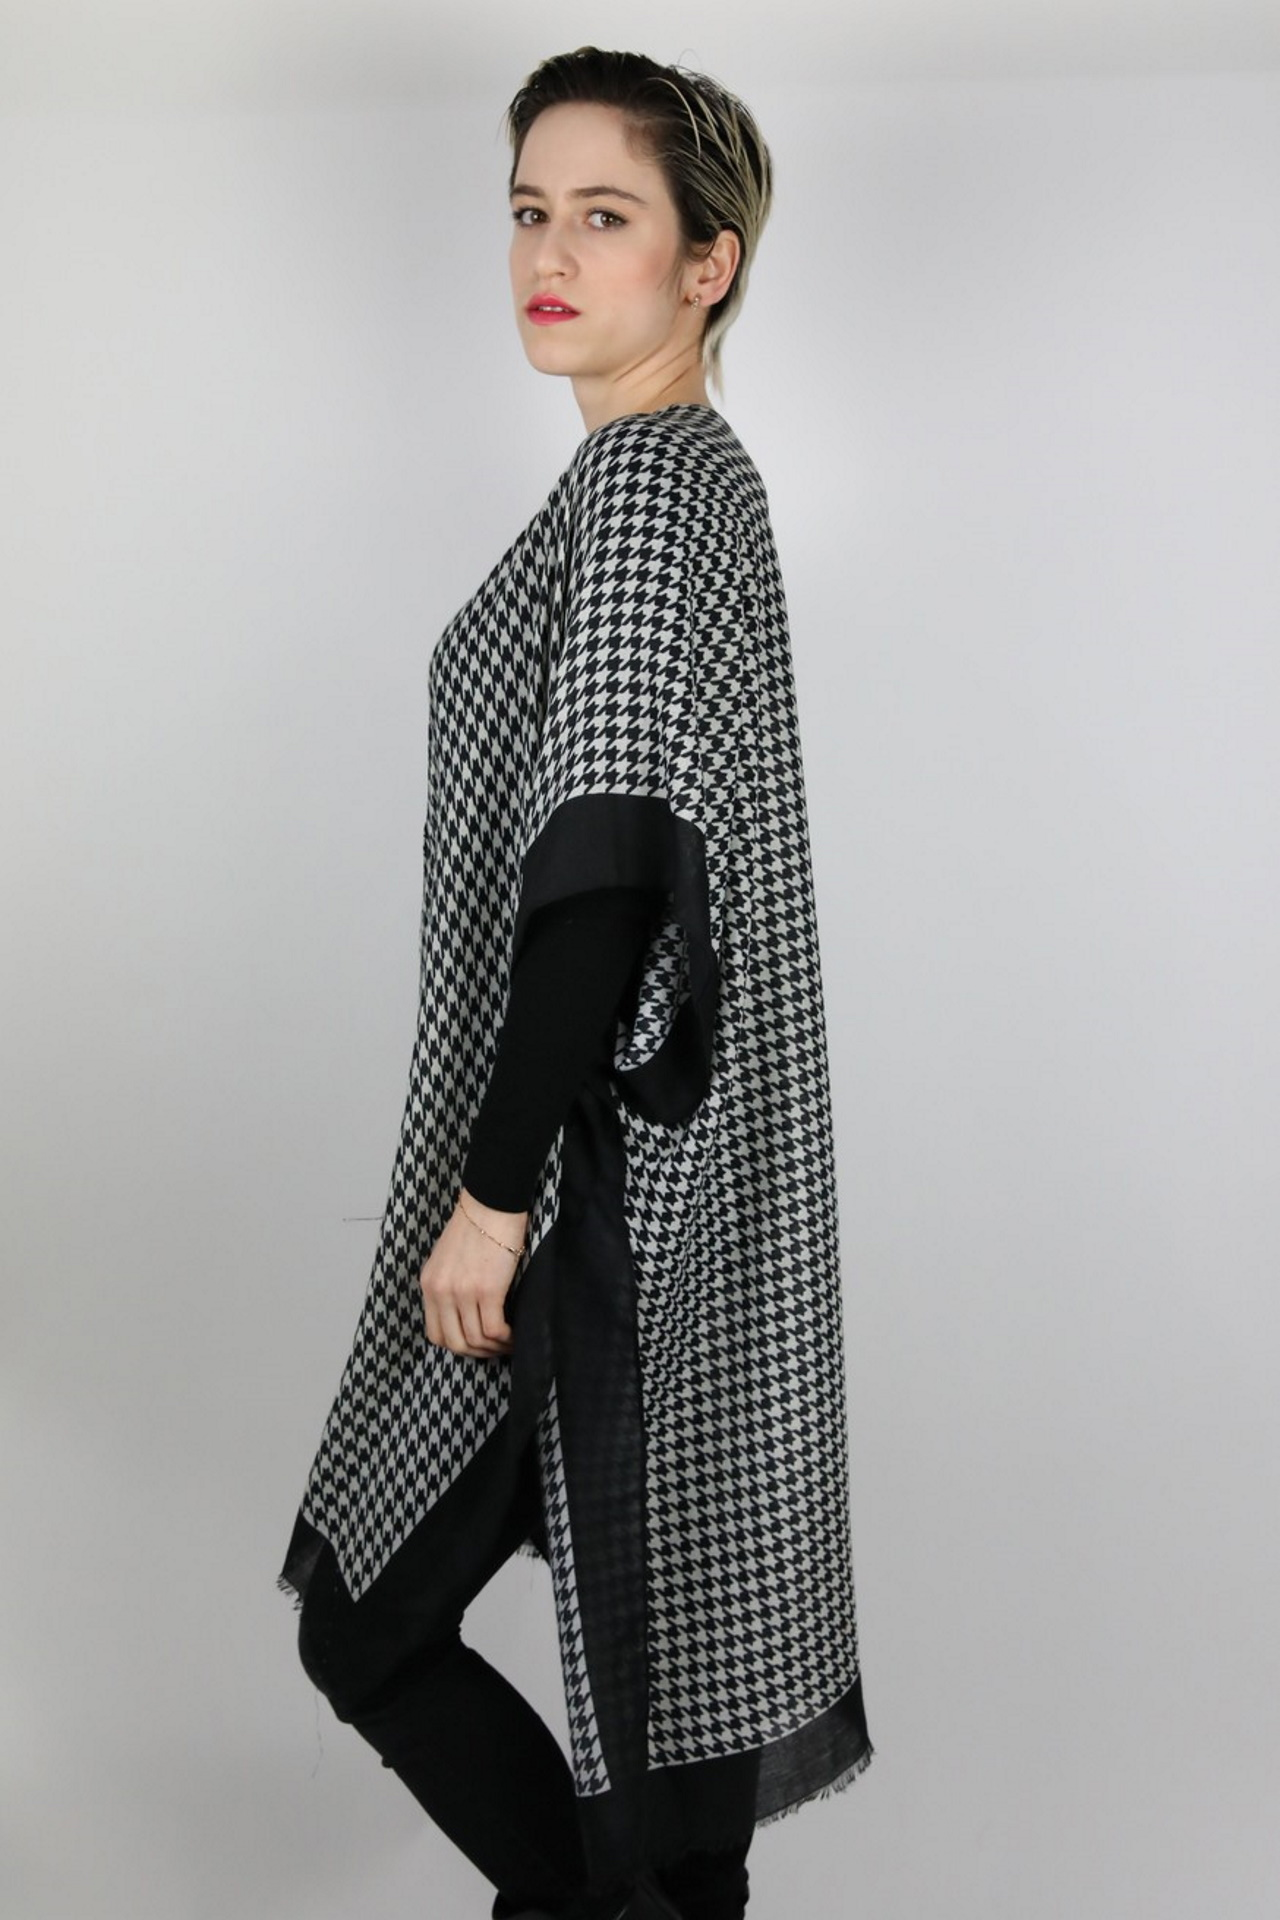 CLOTHES04 STOLA DONNA FOULARD CARDIGAN COPRISPALLE 2 1stAmerican elegante stola da donna foulard cardigan coprispalle